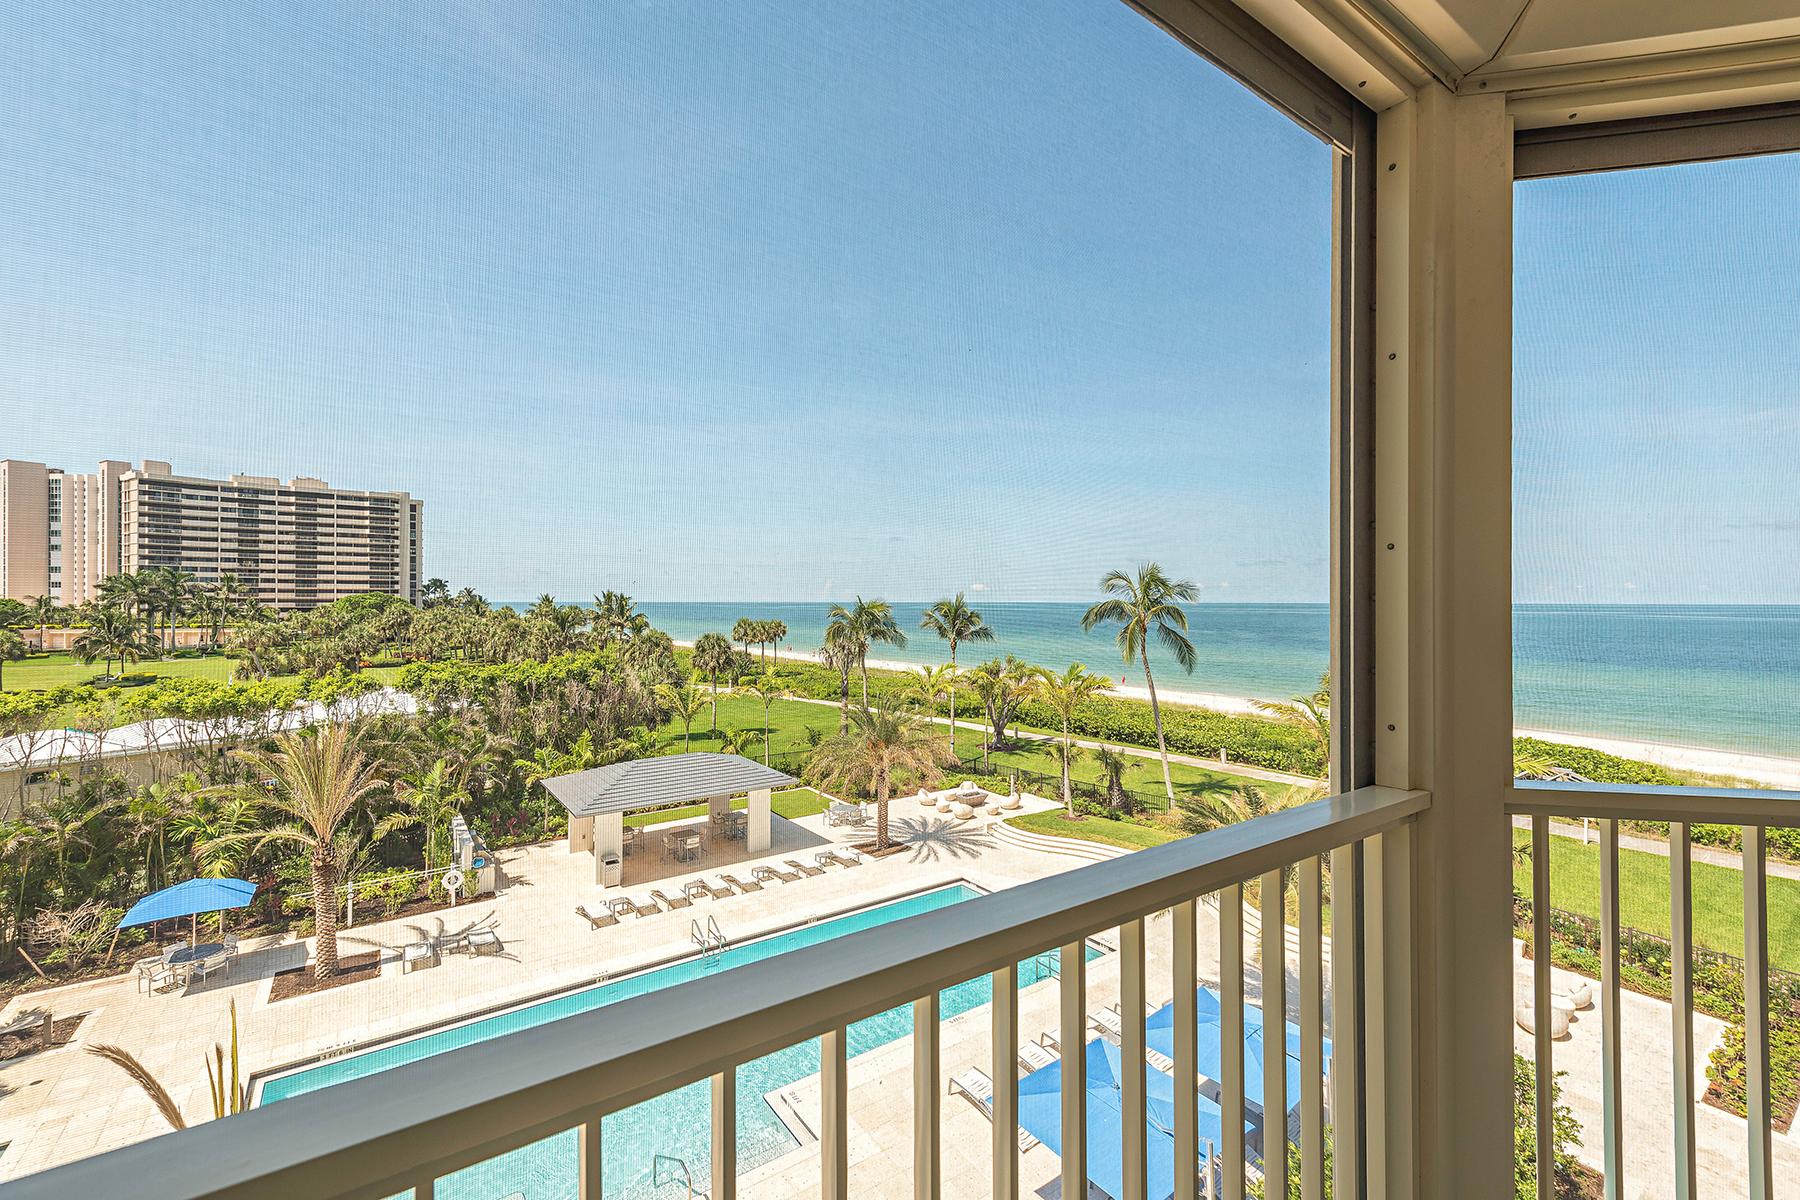 Condominium for Sale at PARK SHORE - LA MER 4051 Gulf Shore Blvd N 405 Naples, Florida, 34103 United States